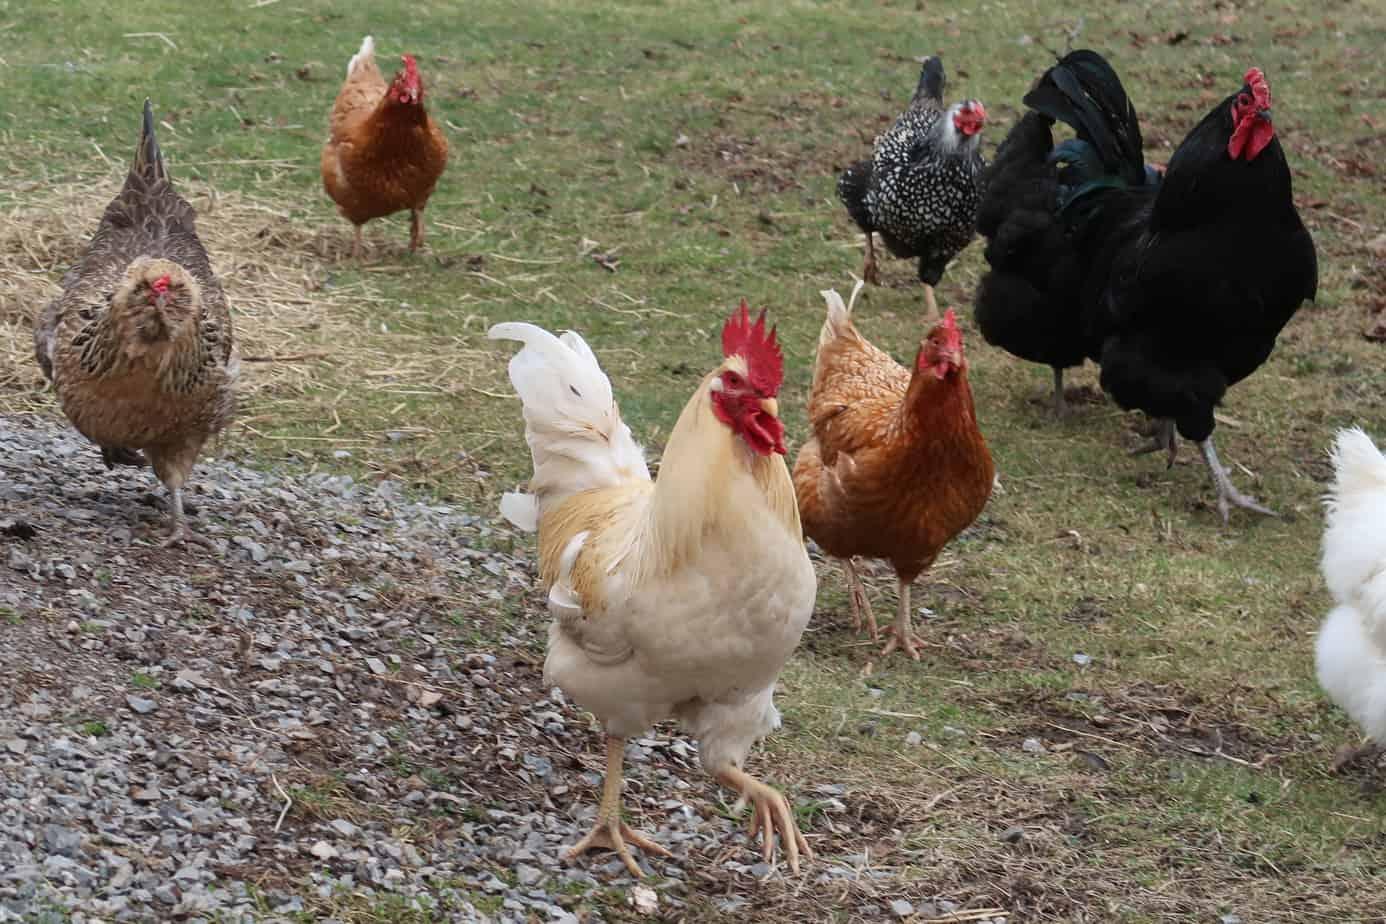 raise chickens